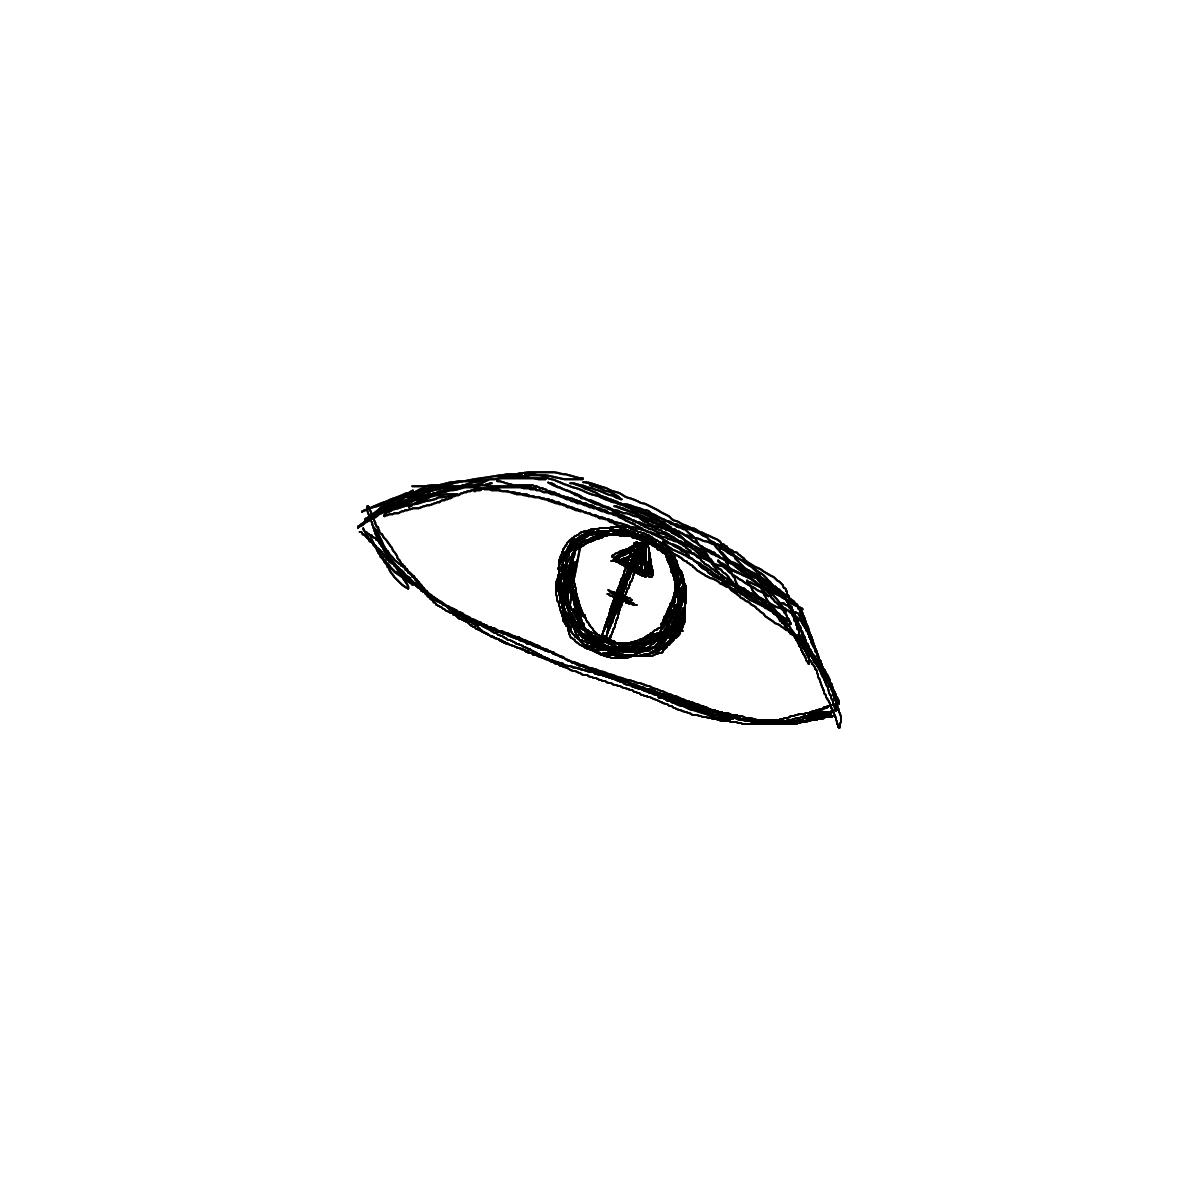 BAAAM drawing#22635 lat:55.7520790100097660lng: 37.6204833984375000